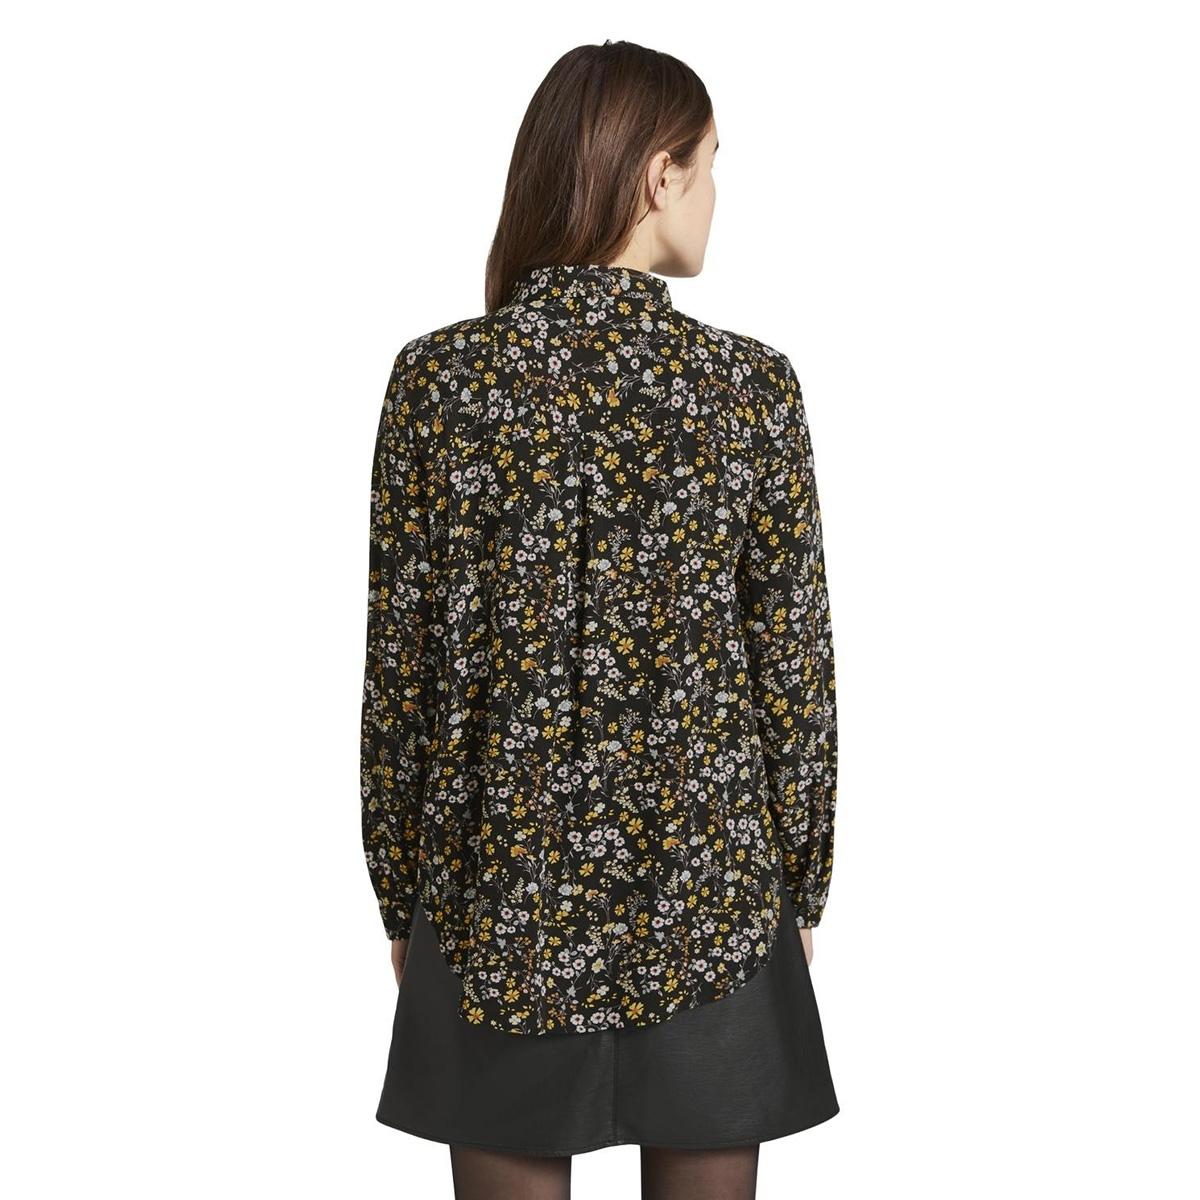 overhemd blouse met patroon 1015036xx71 tom tailor blouse 20410